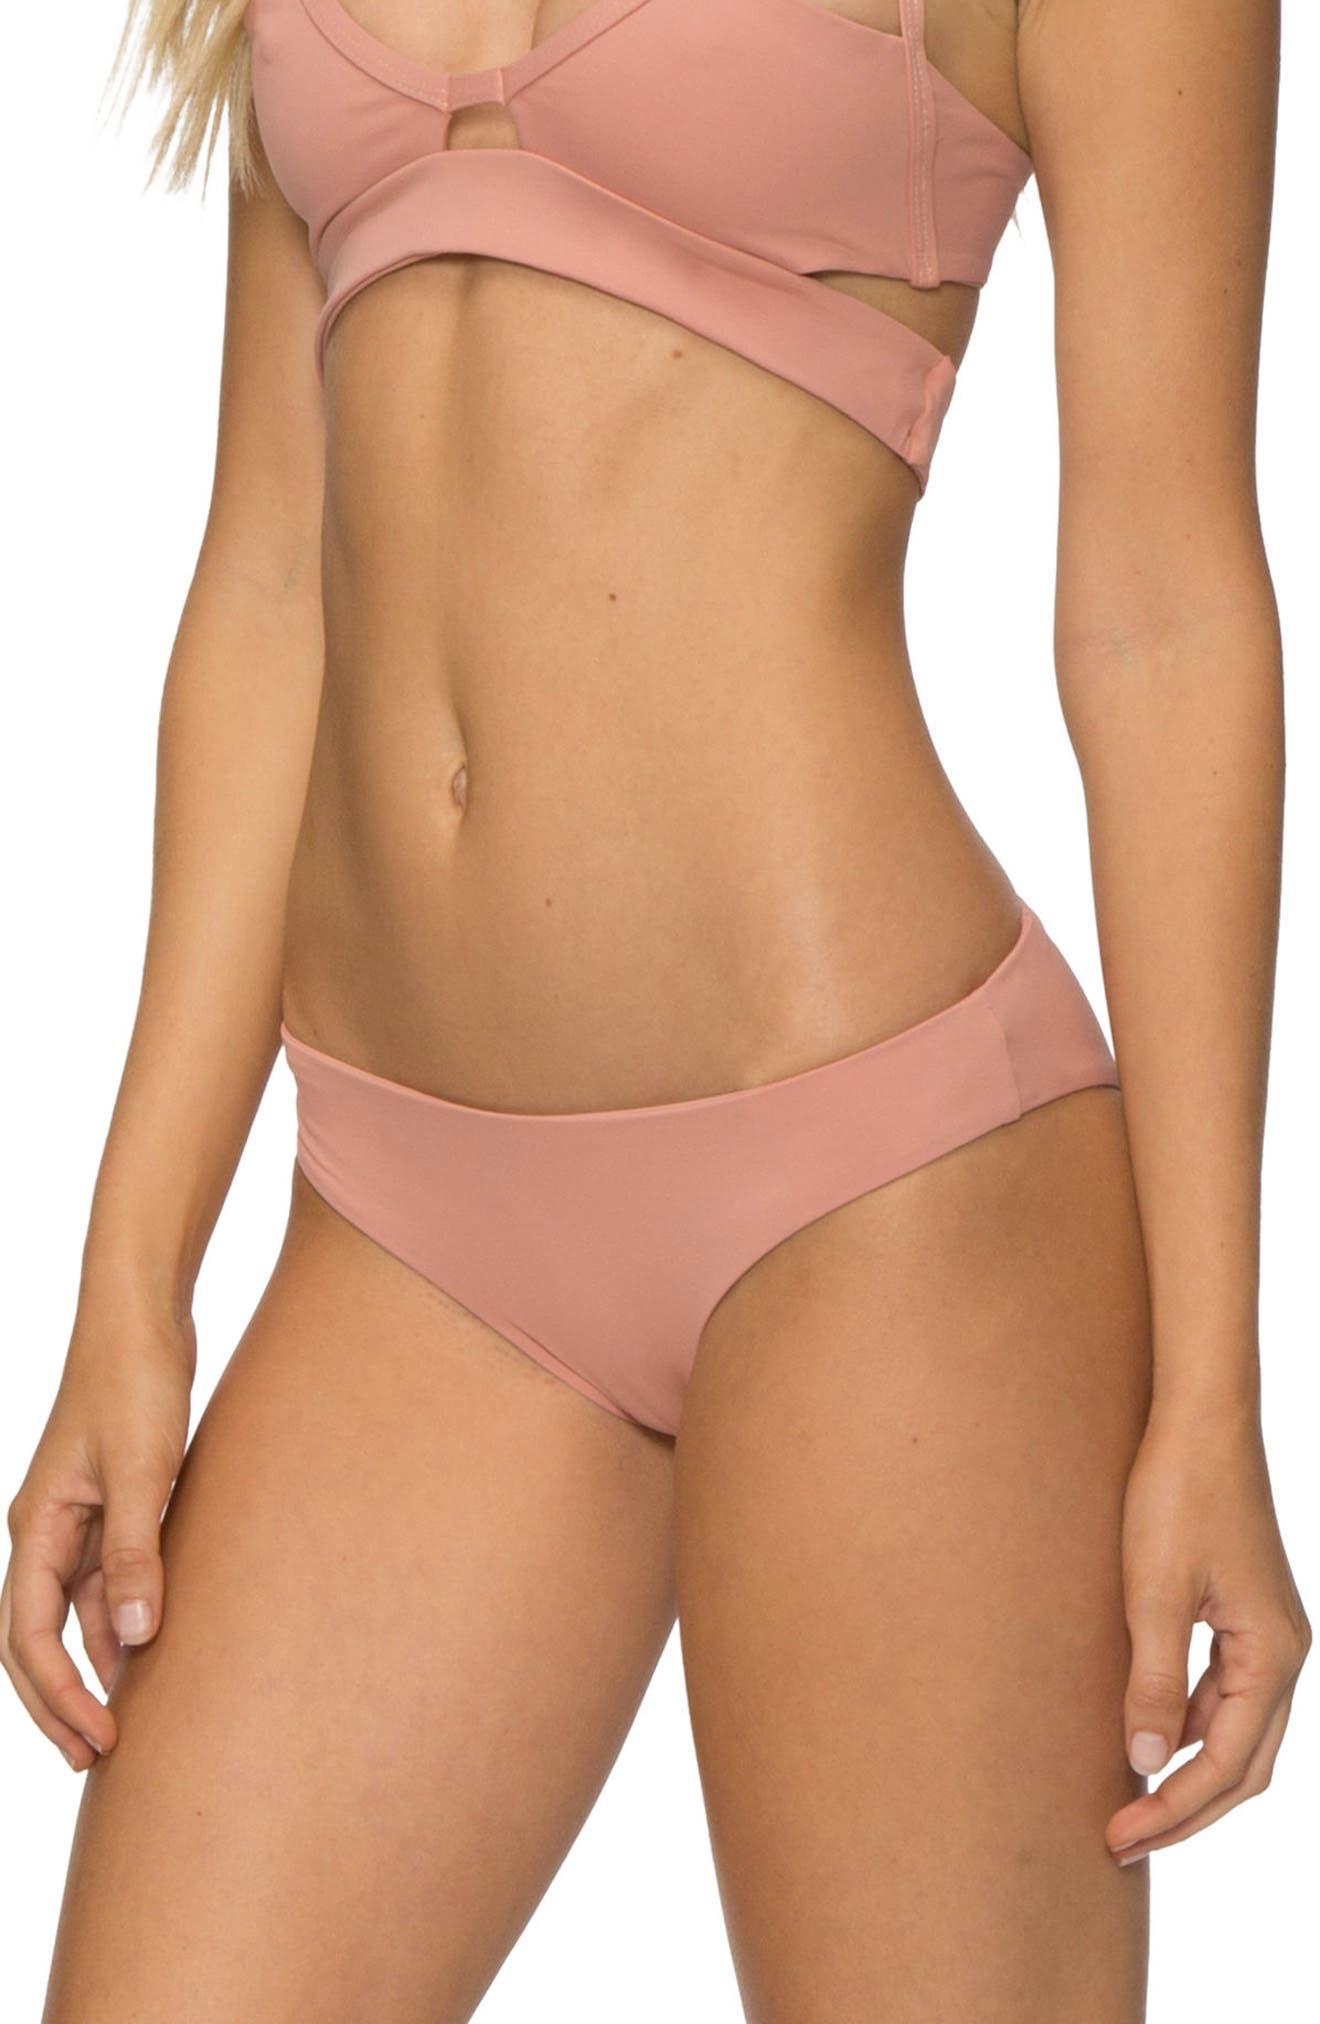 'Ali' Moderate Coverage Bikini Bottoms,                             Alternate thumbnail 3, color,                             ROSE DAWN